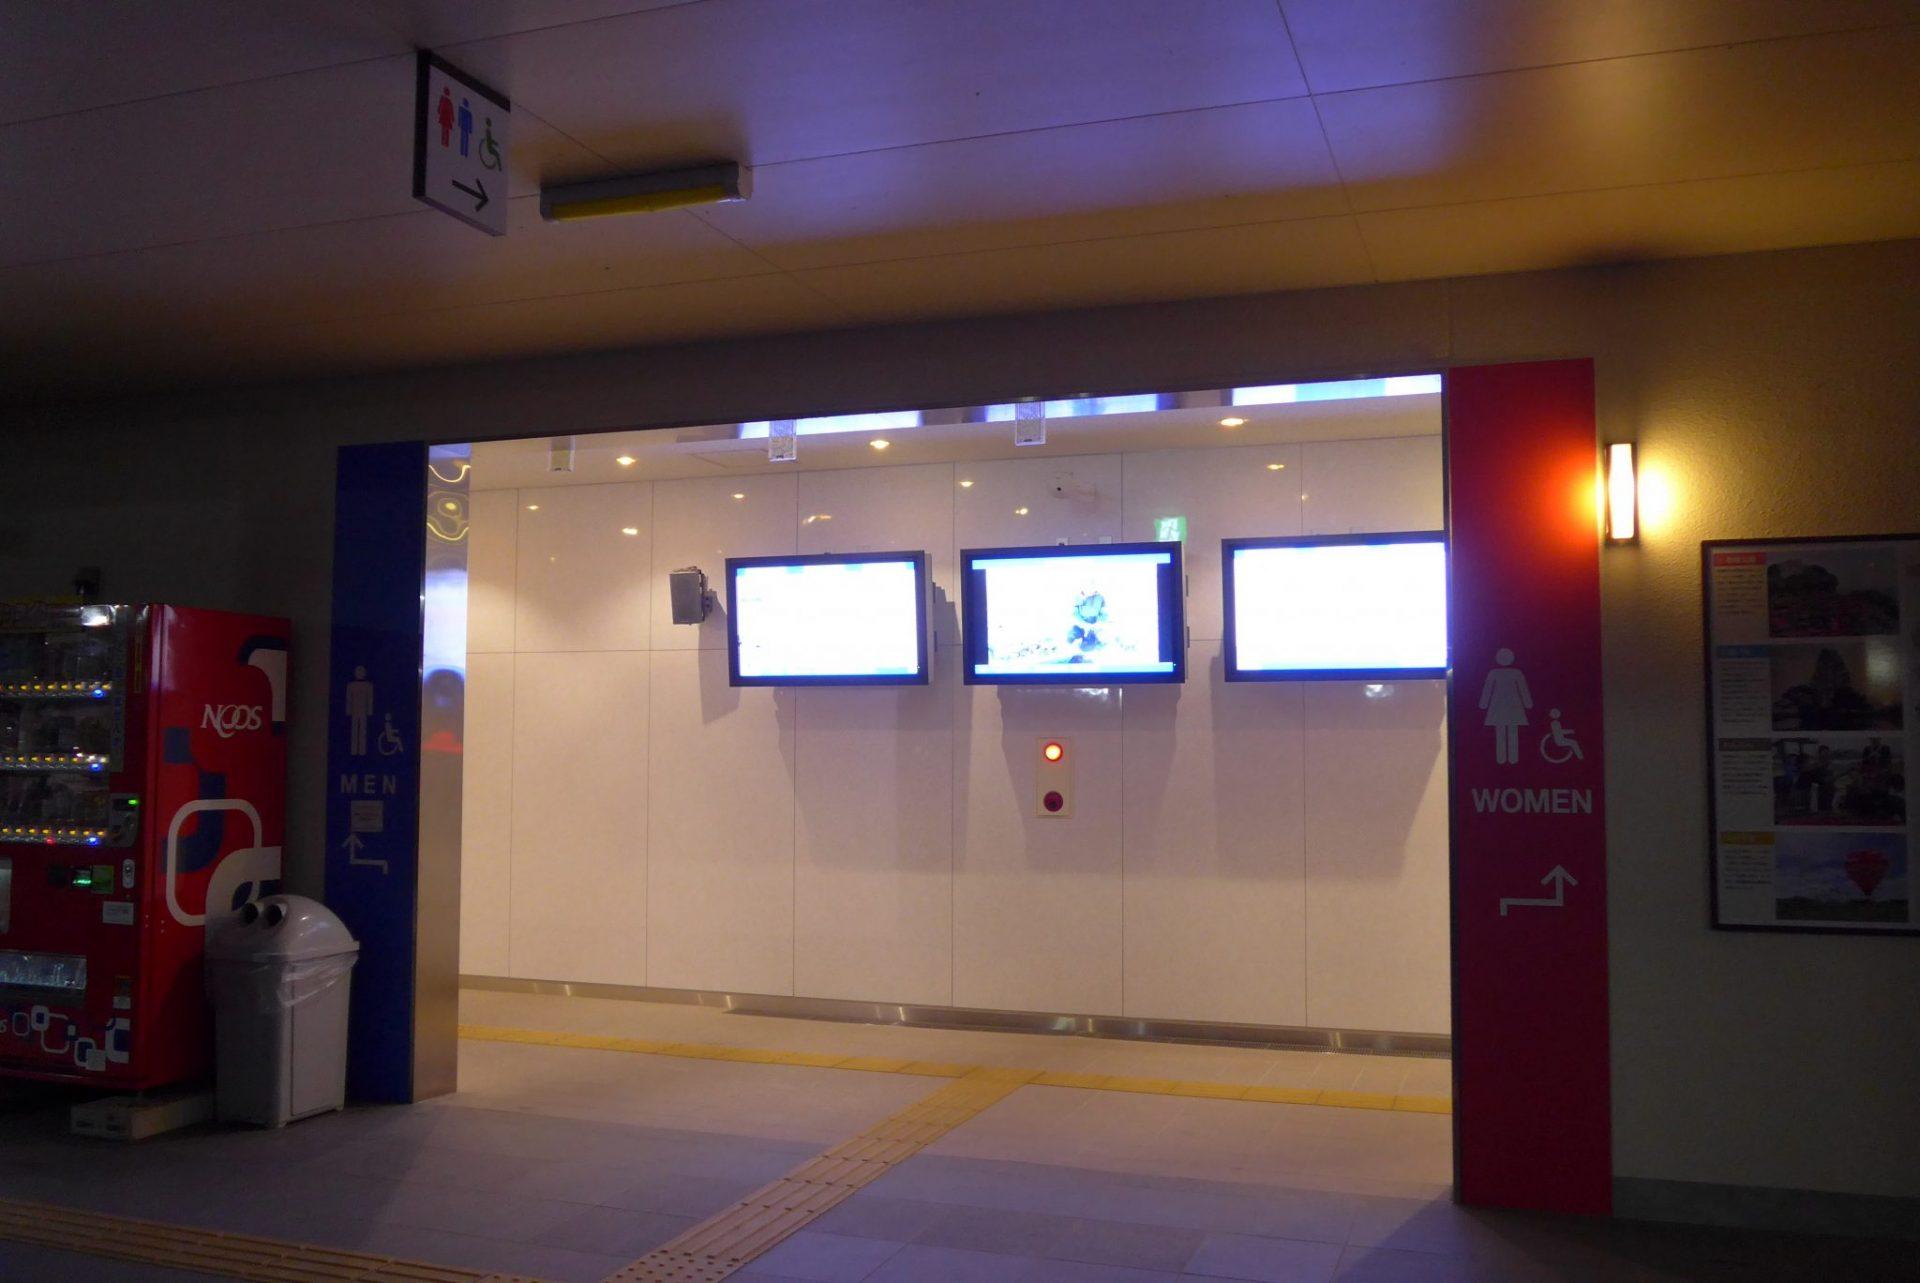 (K)道の駅しろいし車中泊〜静かな夜と広大感ある環境が魅力の施設